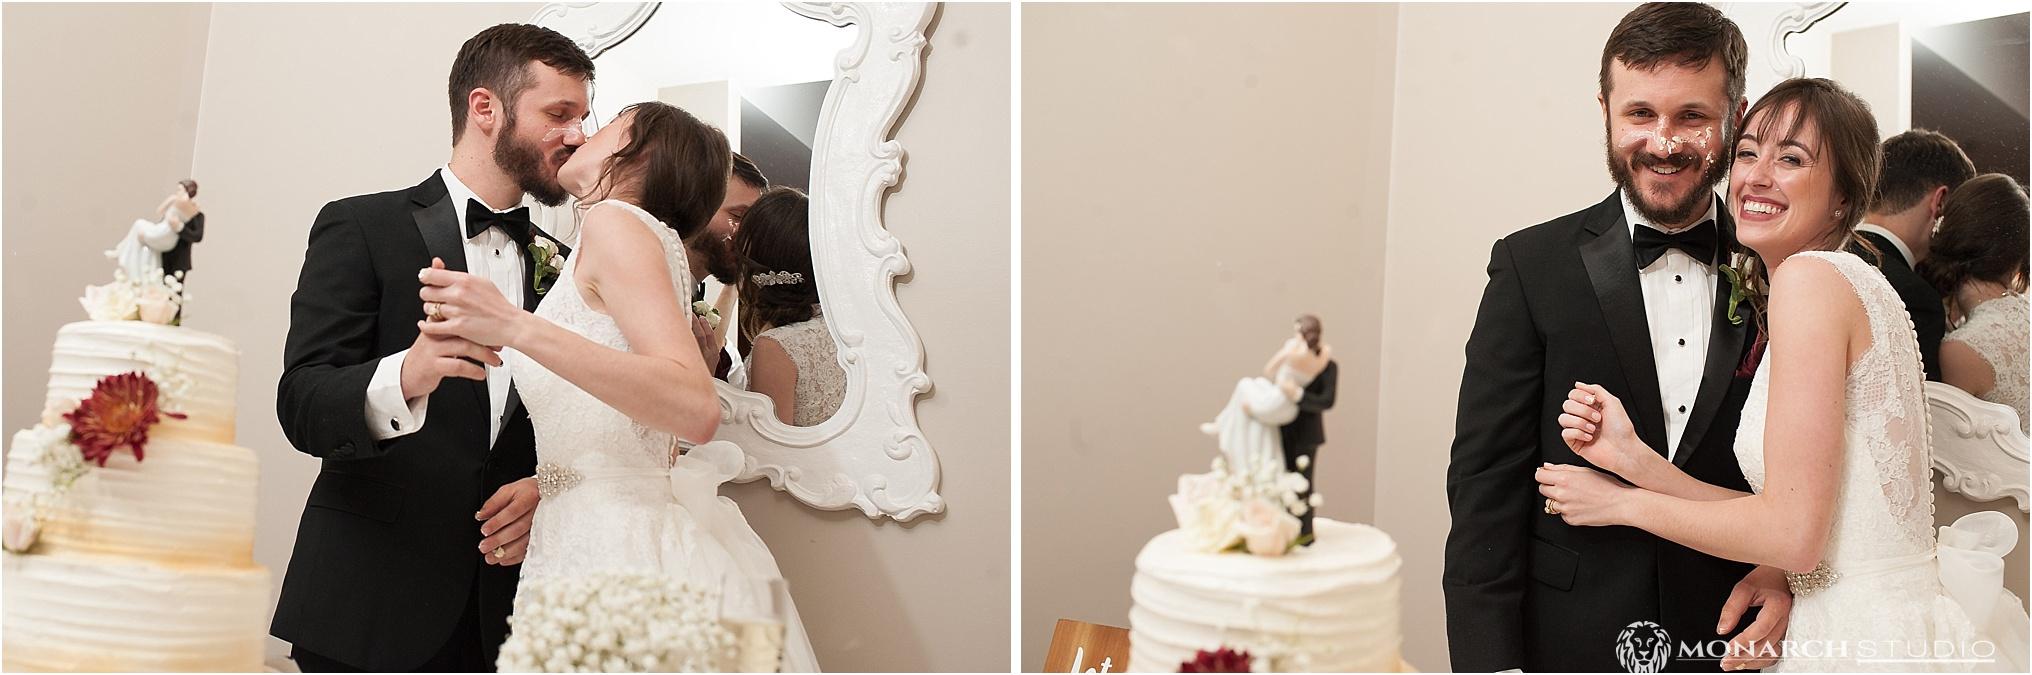 st-augustine-wedding-photographer-white-room-120.jpg